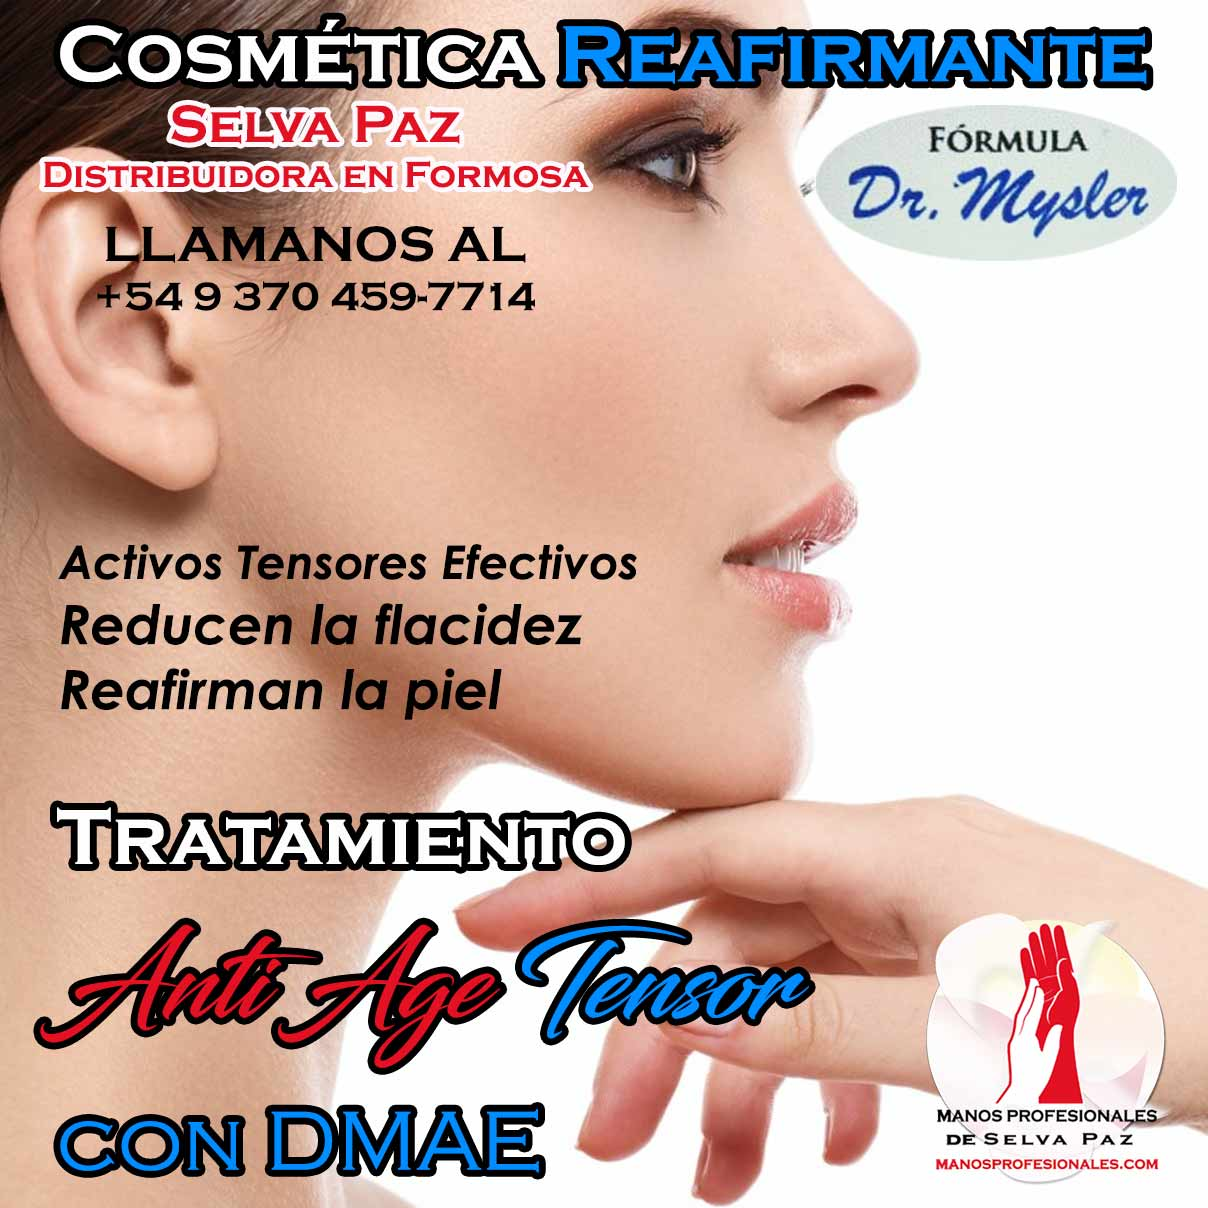 La cosmética reafirmante con DMAE Dr. Mysler